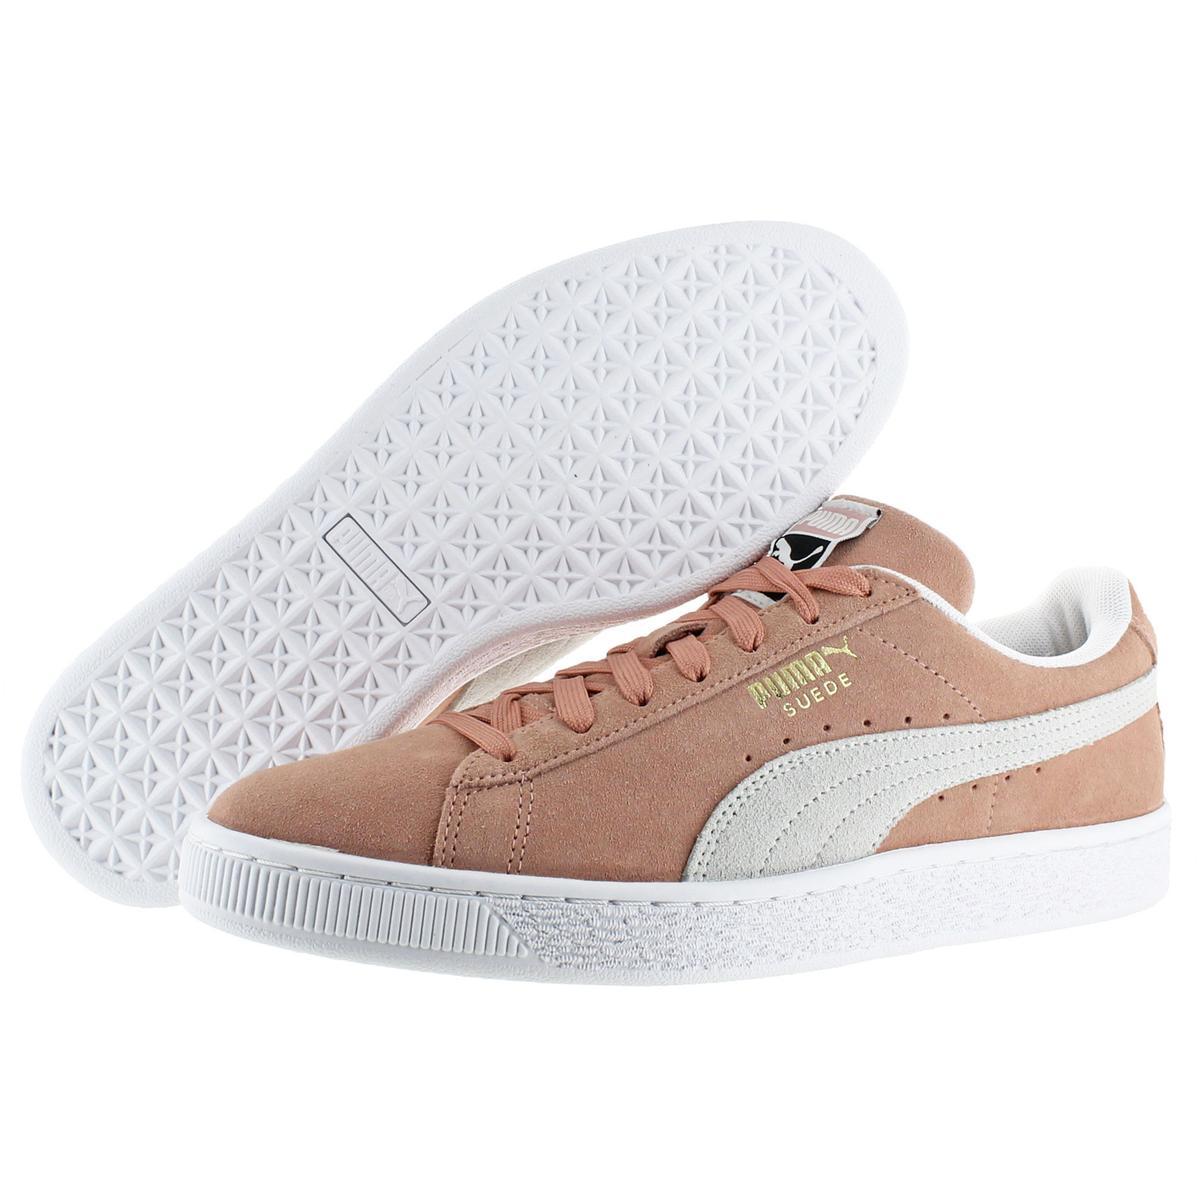 Puma-Suede-Classic-Men-039-s-Fashion-Sneakers-Shoes